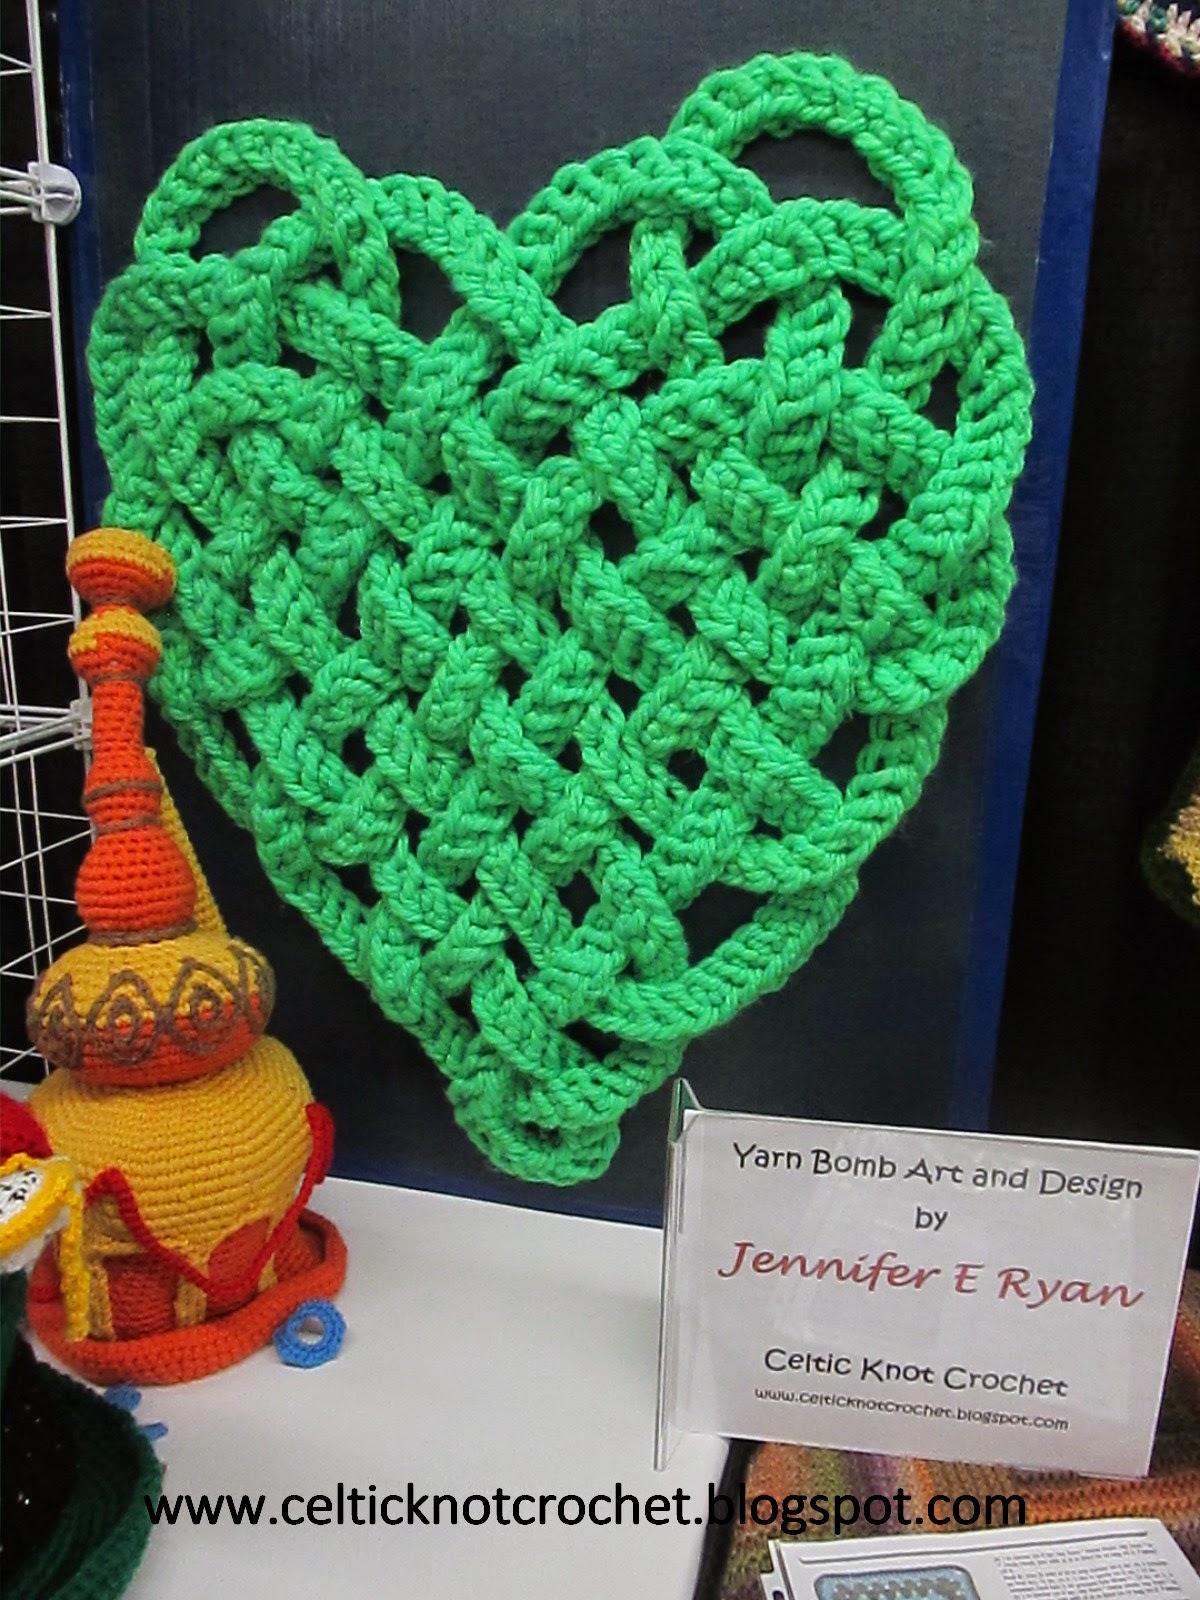 Celtic Knot Crochet Designs - Celtic Knot Crochet